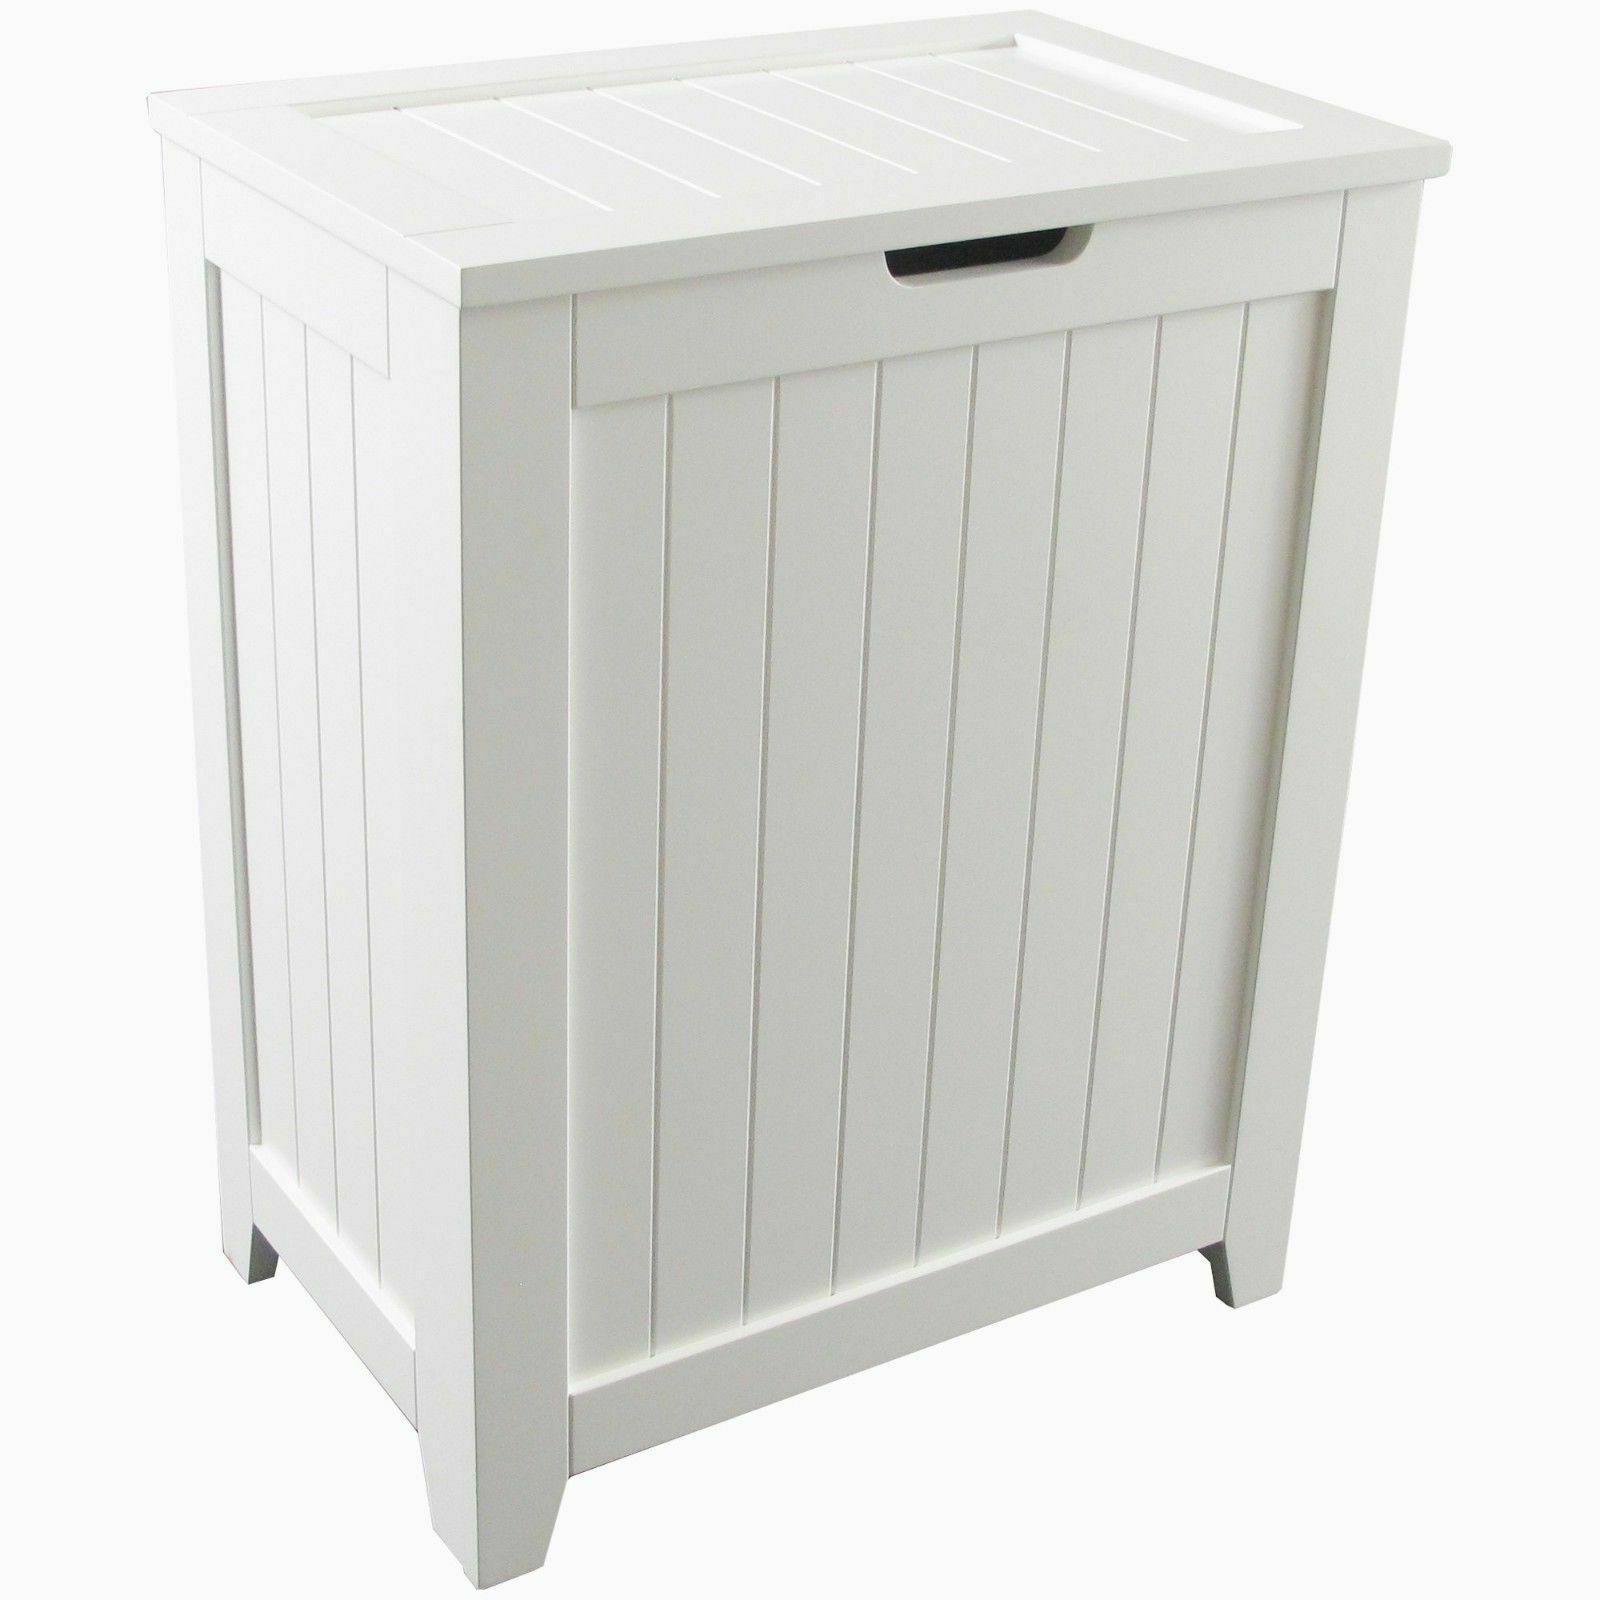 Wooden Laundry Hamper- White Basket Washing Bin Clothes Orga